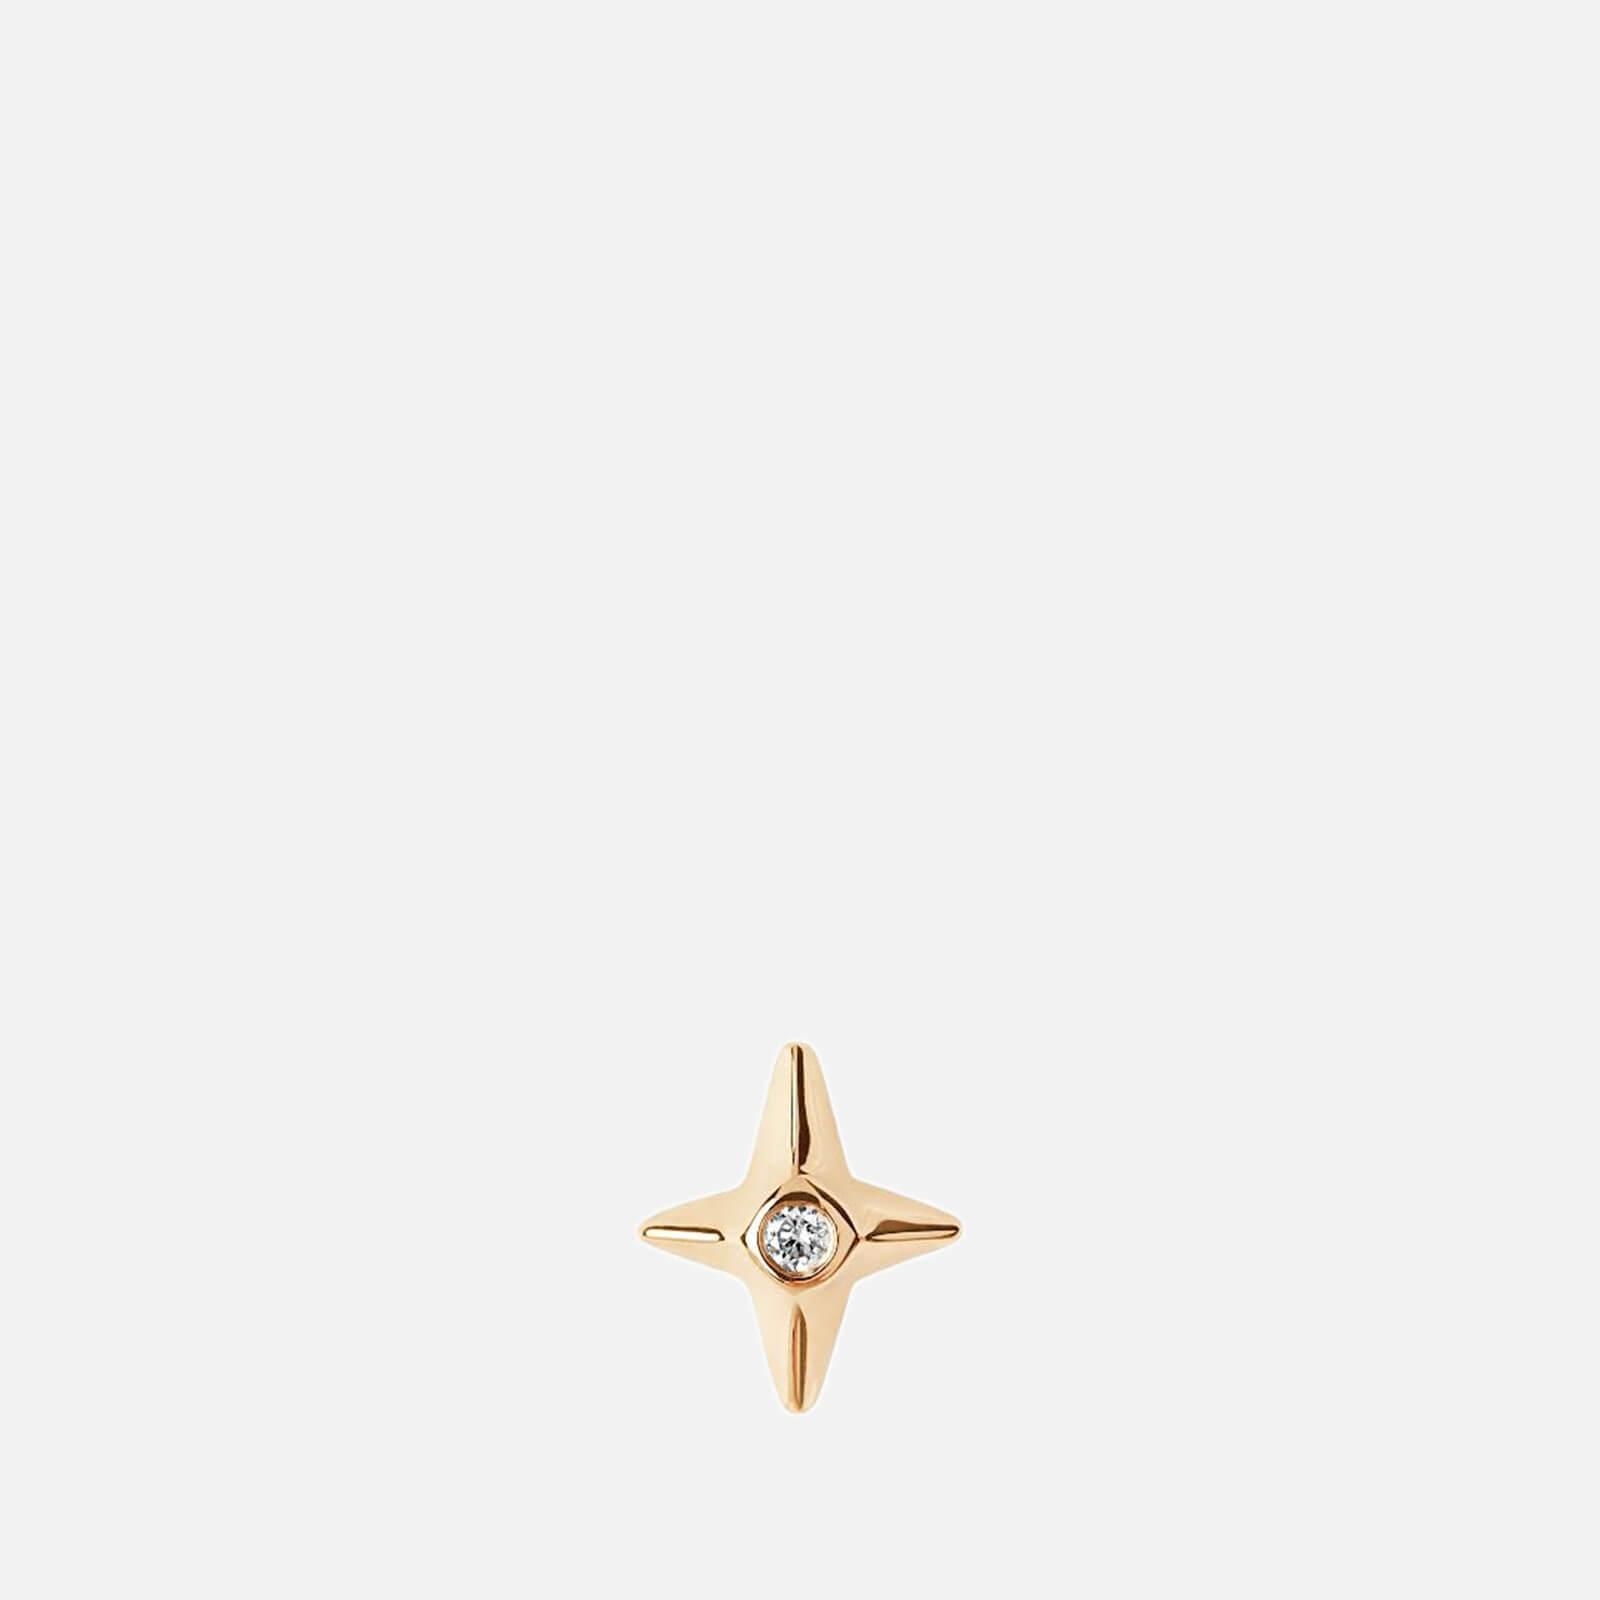 Maria Black Women's Diamond Star Labret - Gold